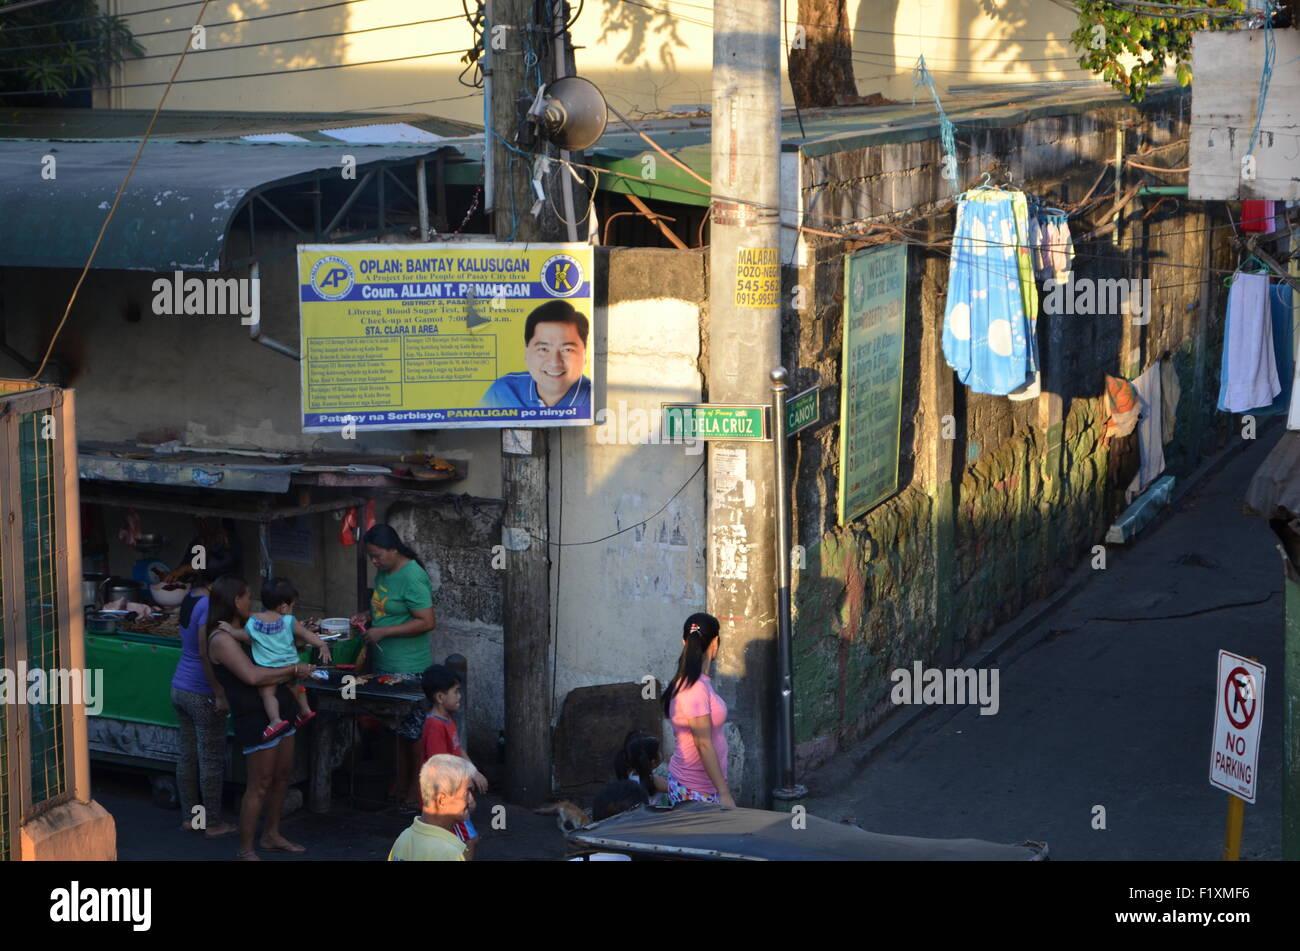 M.Dela Cruz, Manila. A street corner where crowds gather to taste thesausages being warmedup for hem.Abovethemthelocalpolitician - Stock Image